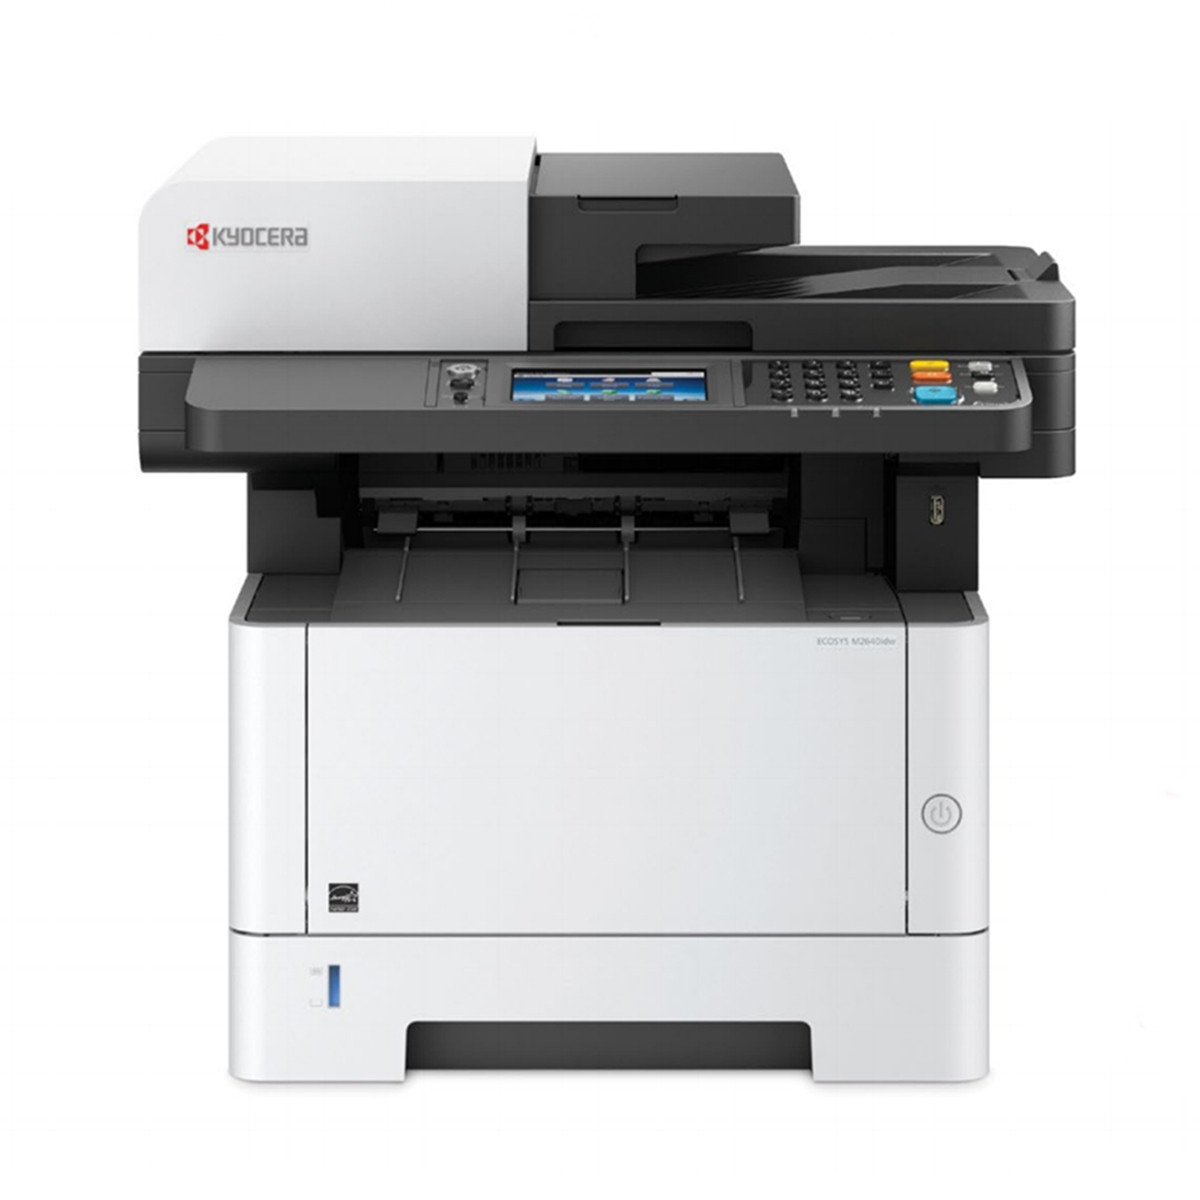 Impressora Kyocera Ecosys M2640IDW   Multifuncional Laser Monocromática Duplex Completo e Wireless